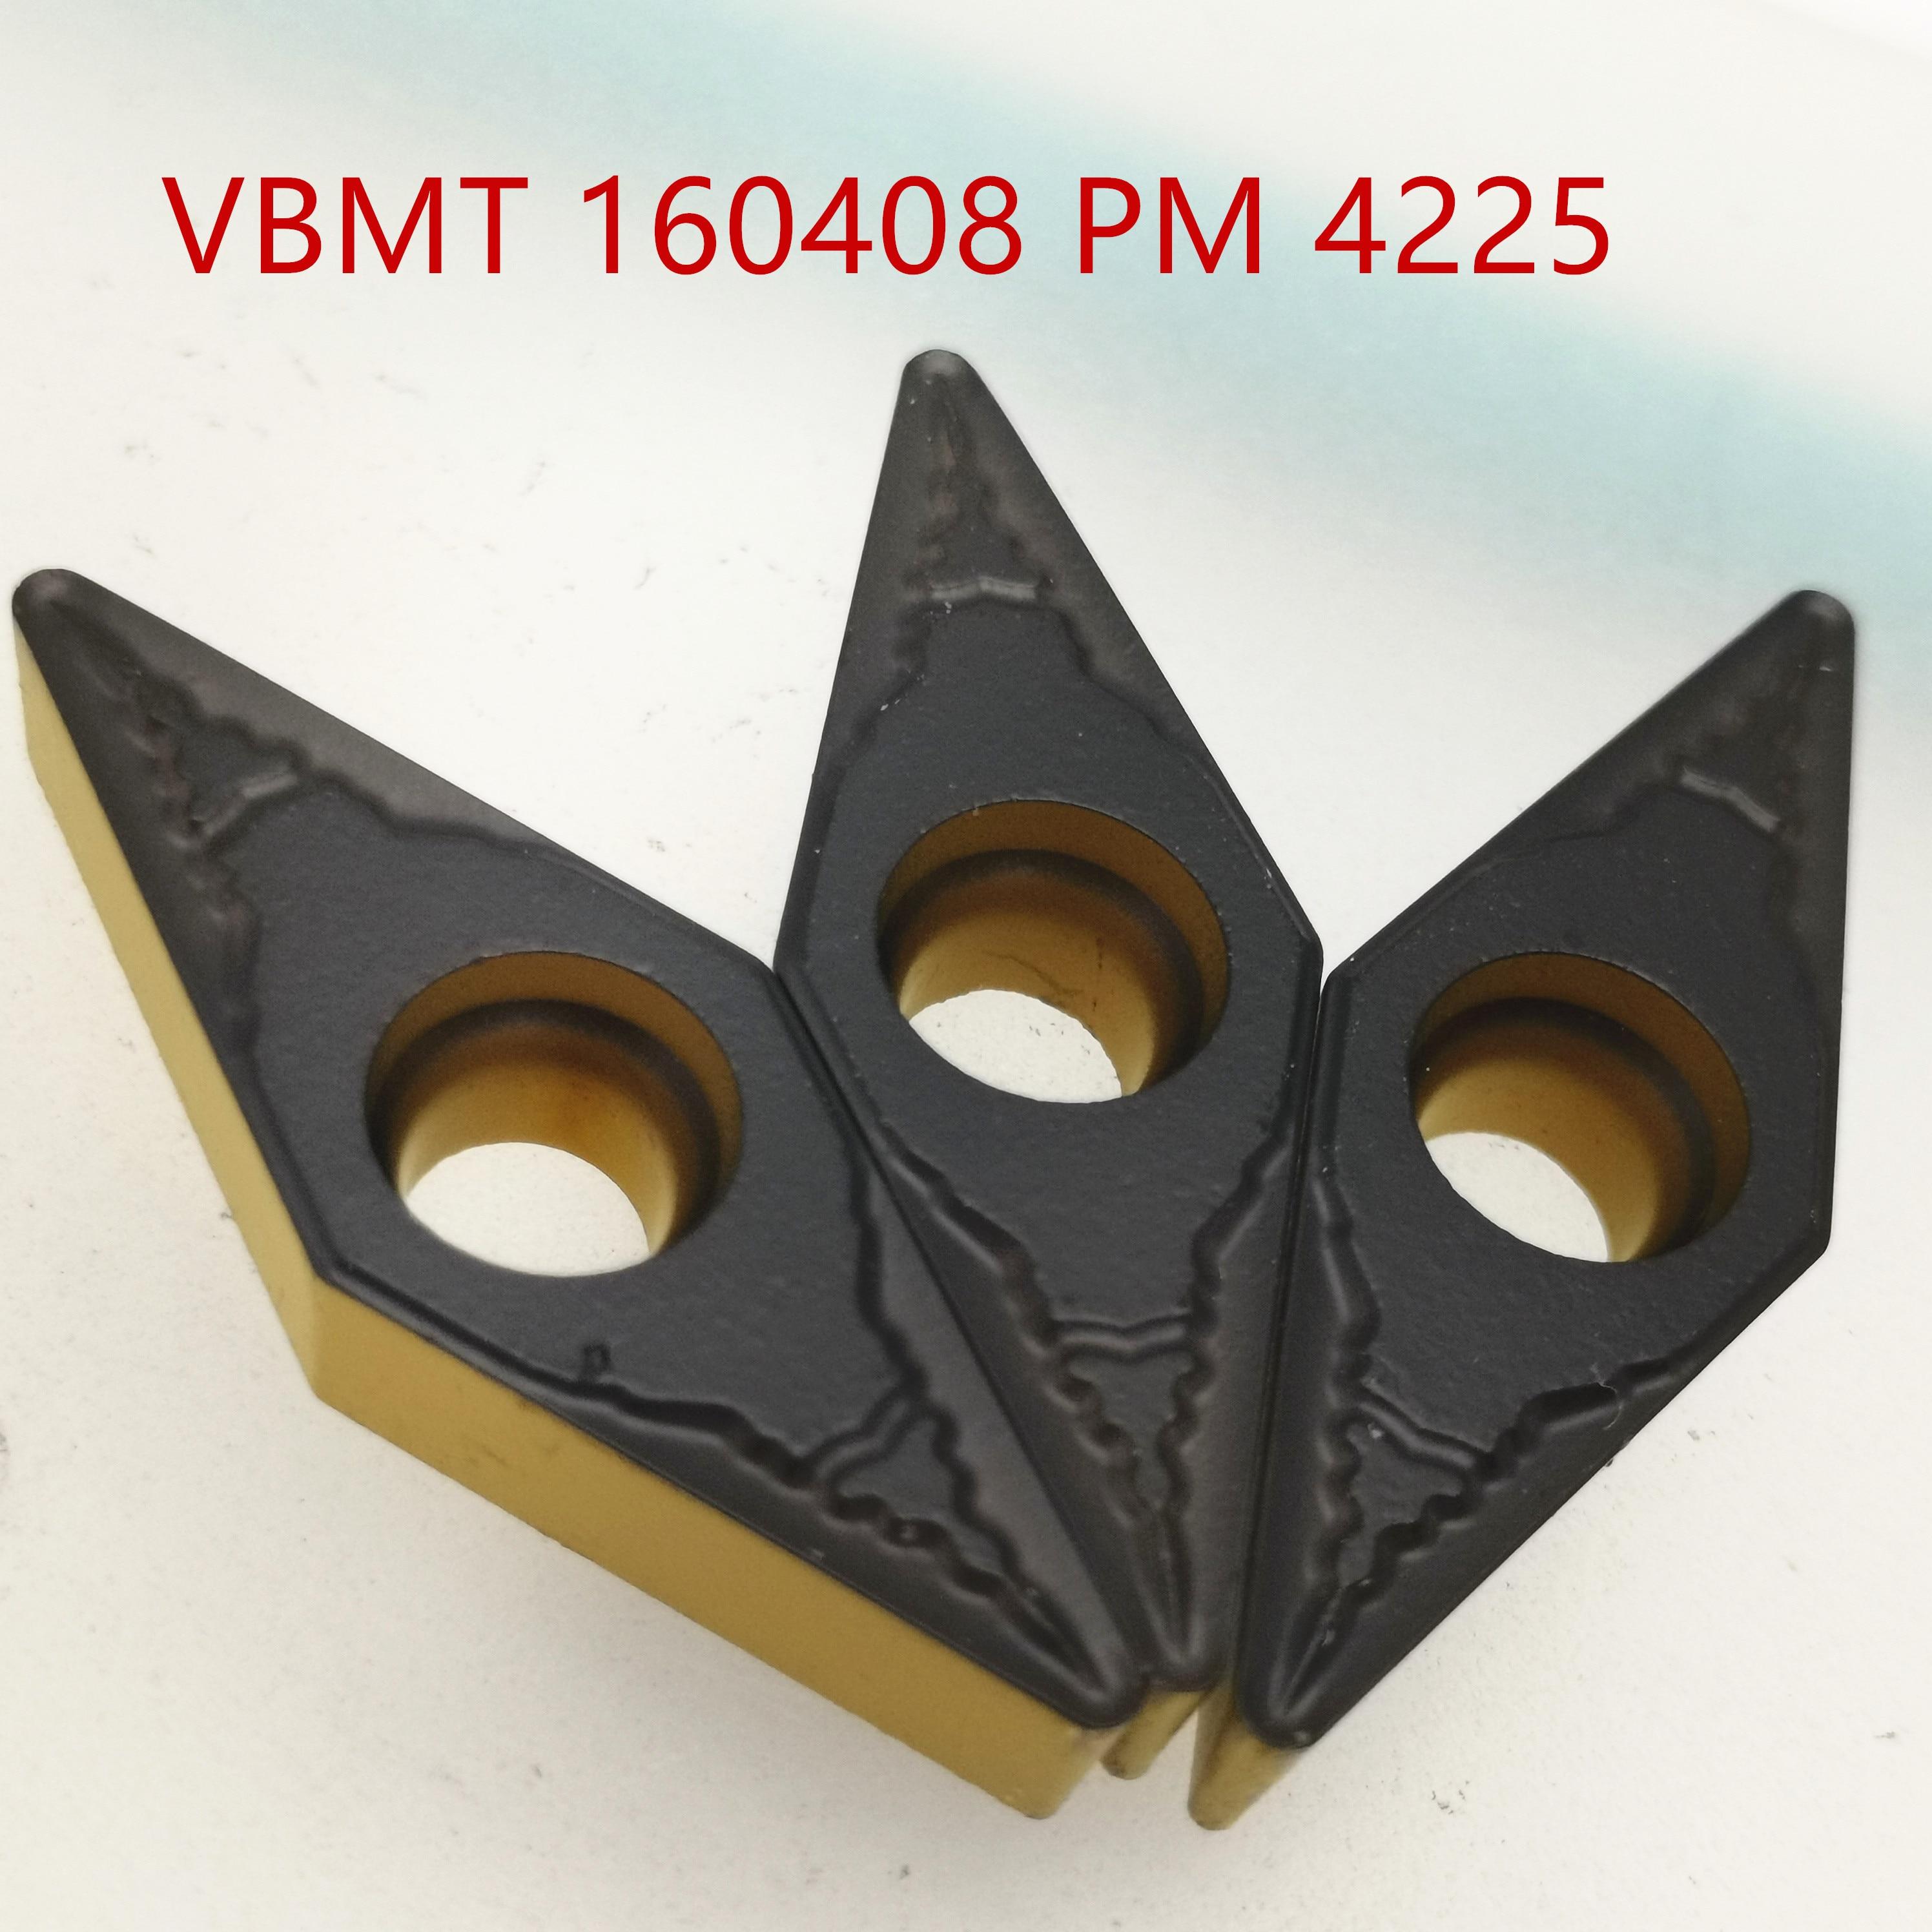 10PCS VBMT160408 PM4225 VBMT 160408  PM 4225 Carbide Insert Turning Tool Lathe Cutter Milling Cutter CNC Cutting Tool VBMT160404